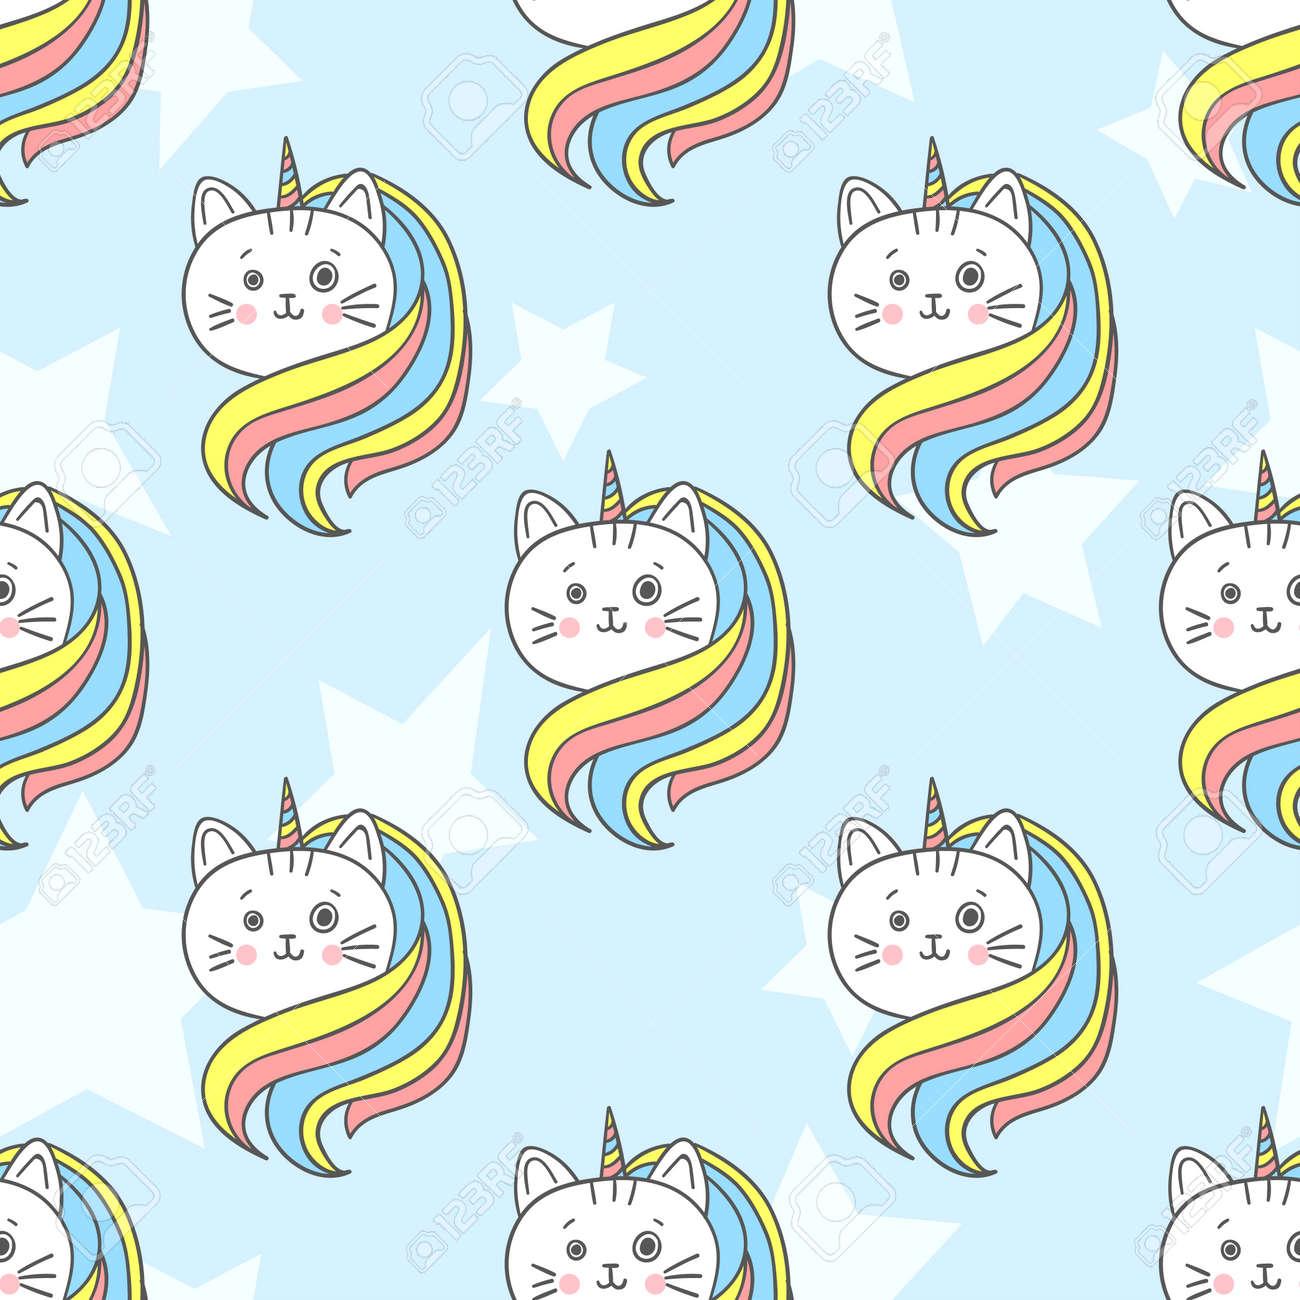 Cute Rainbow Cat Unicorn Seamless Pattern Vector Background